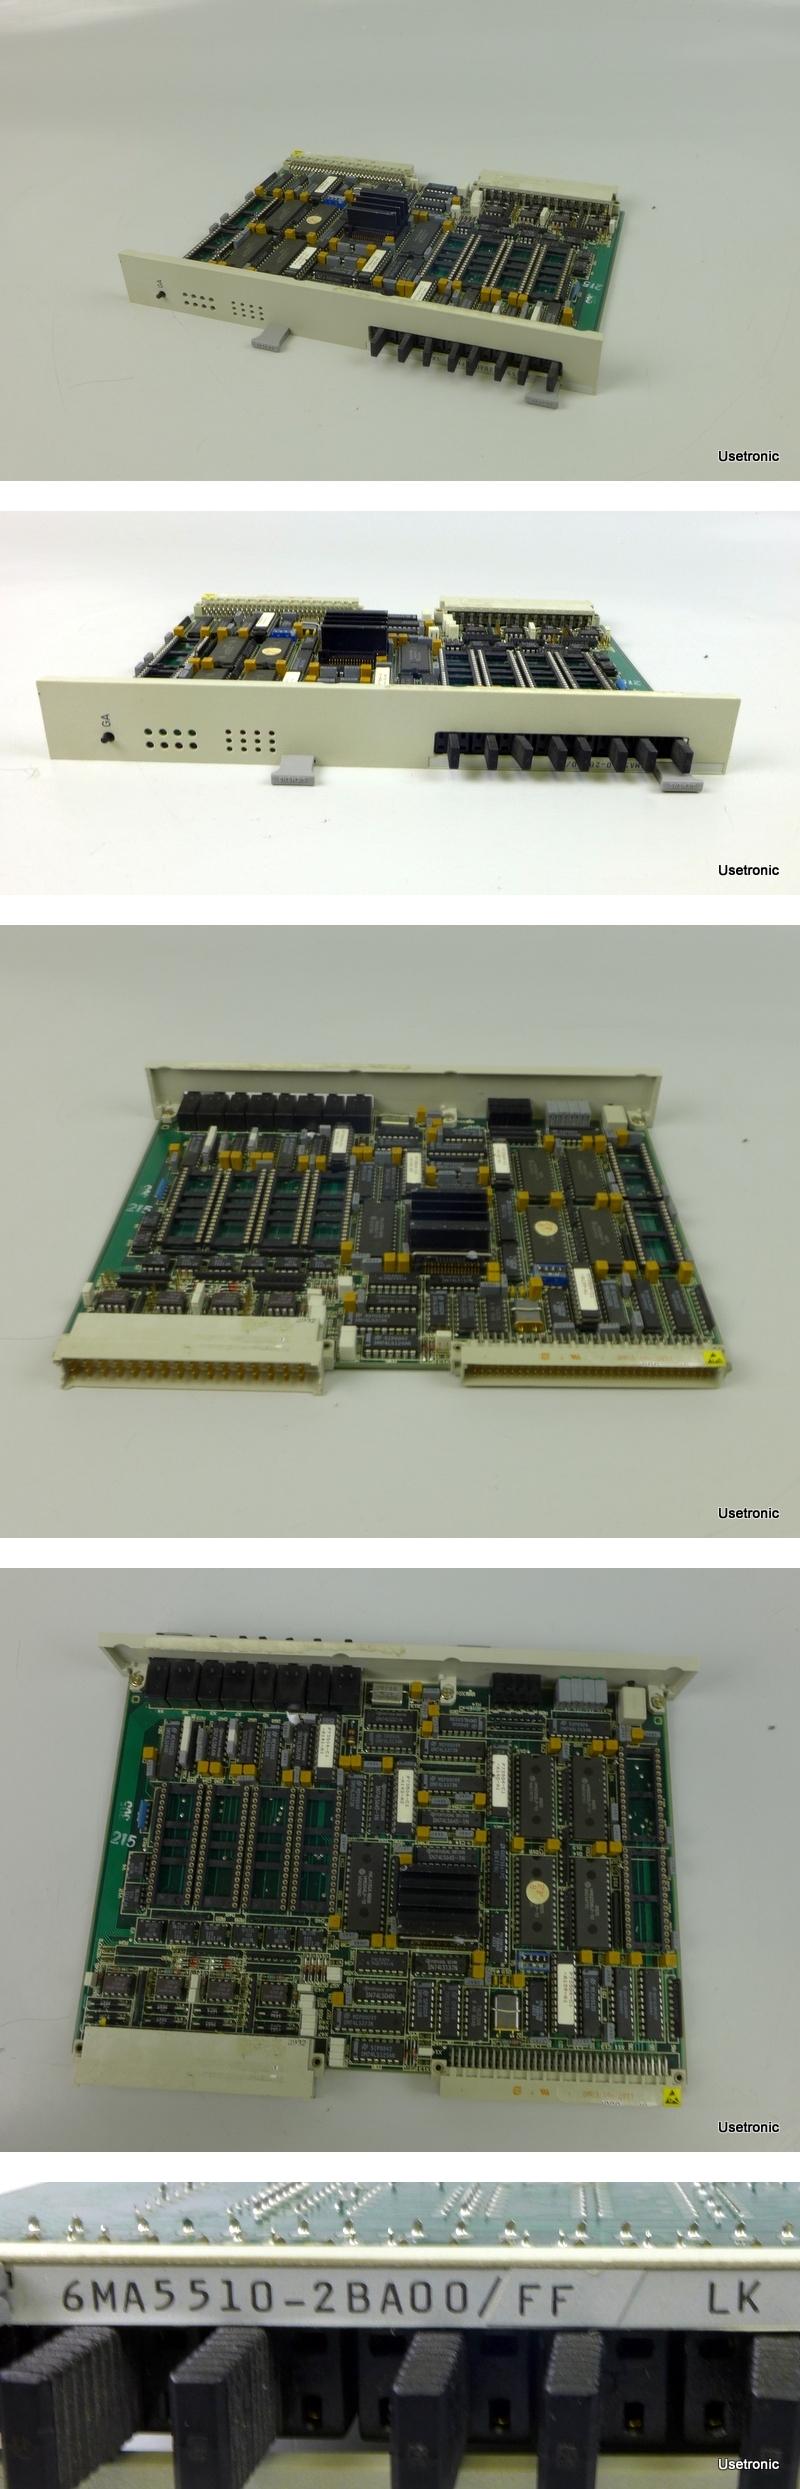 Siemens 6MA5510-2BA00